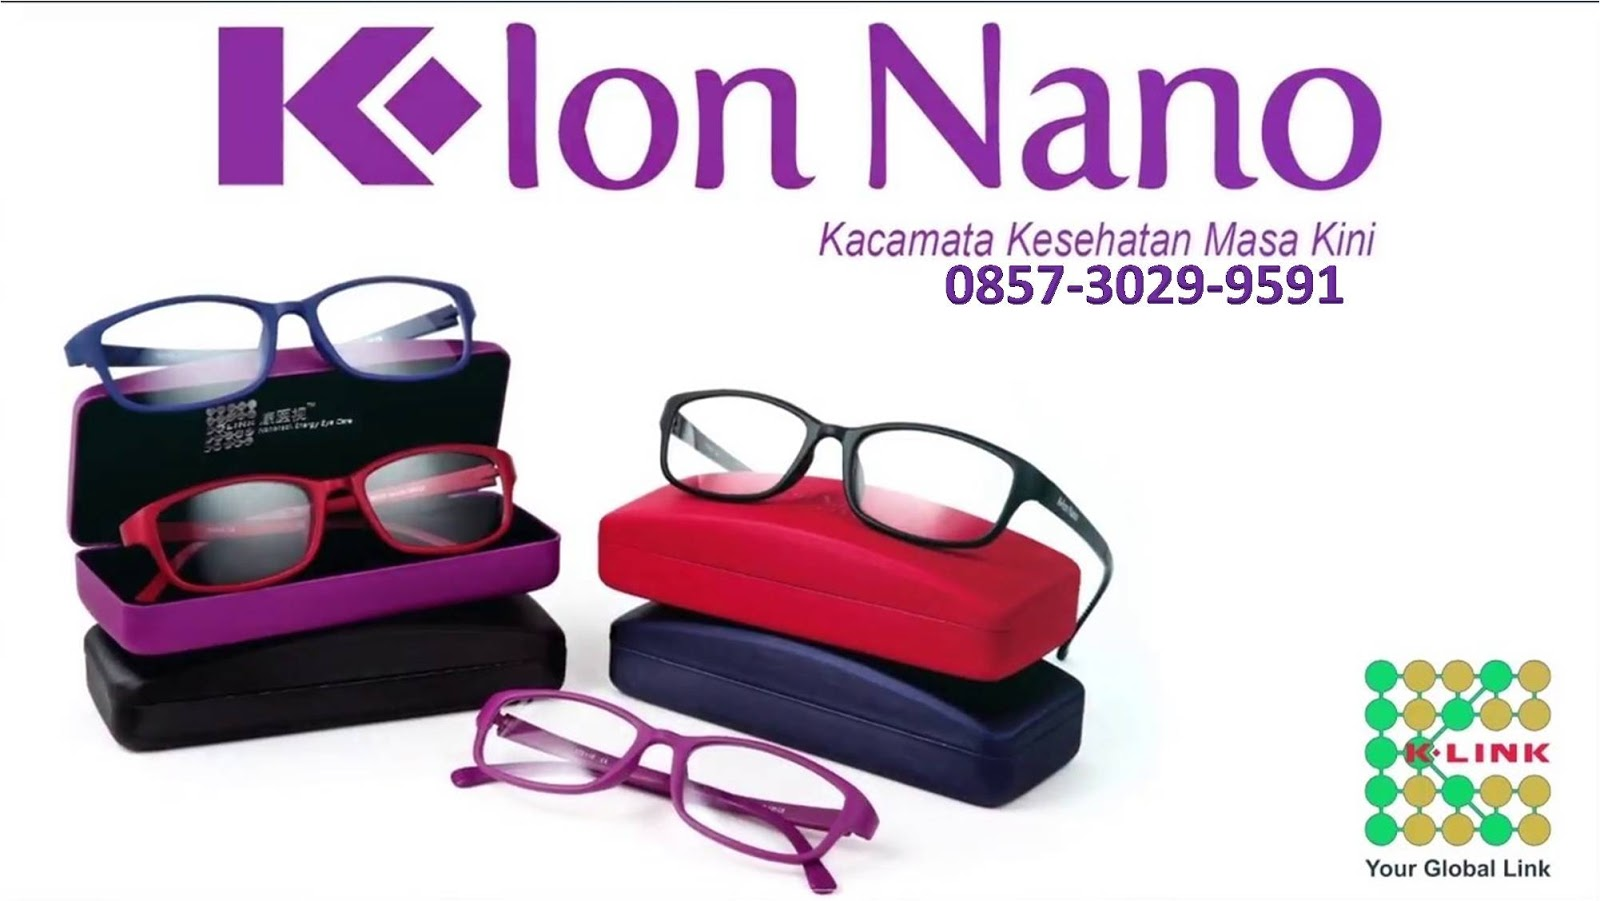 Kacamata Terapi Mata Minus - Harga Baru Produk Terkeren Di Indonesia c0060dc215